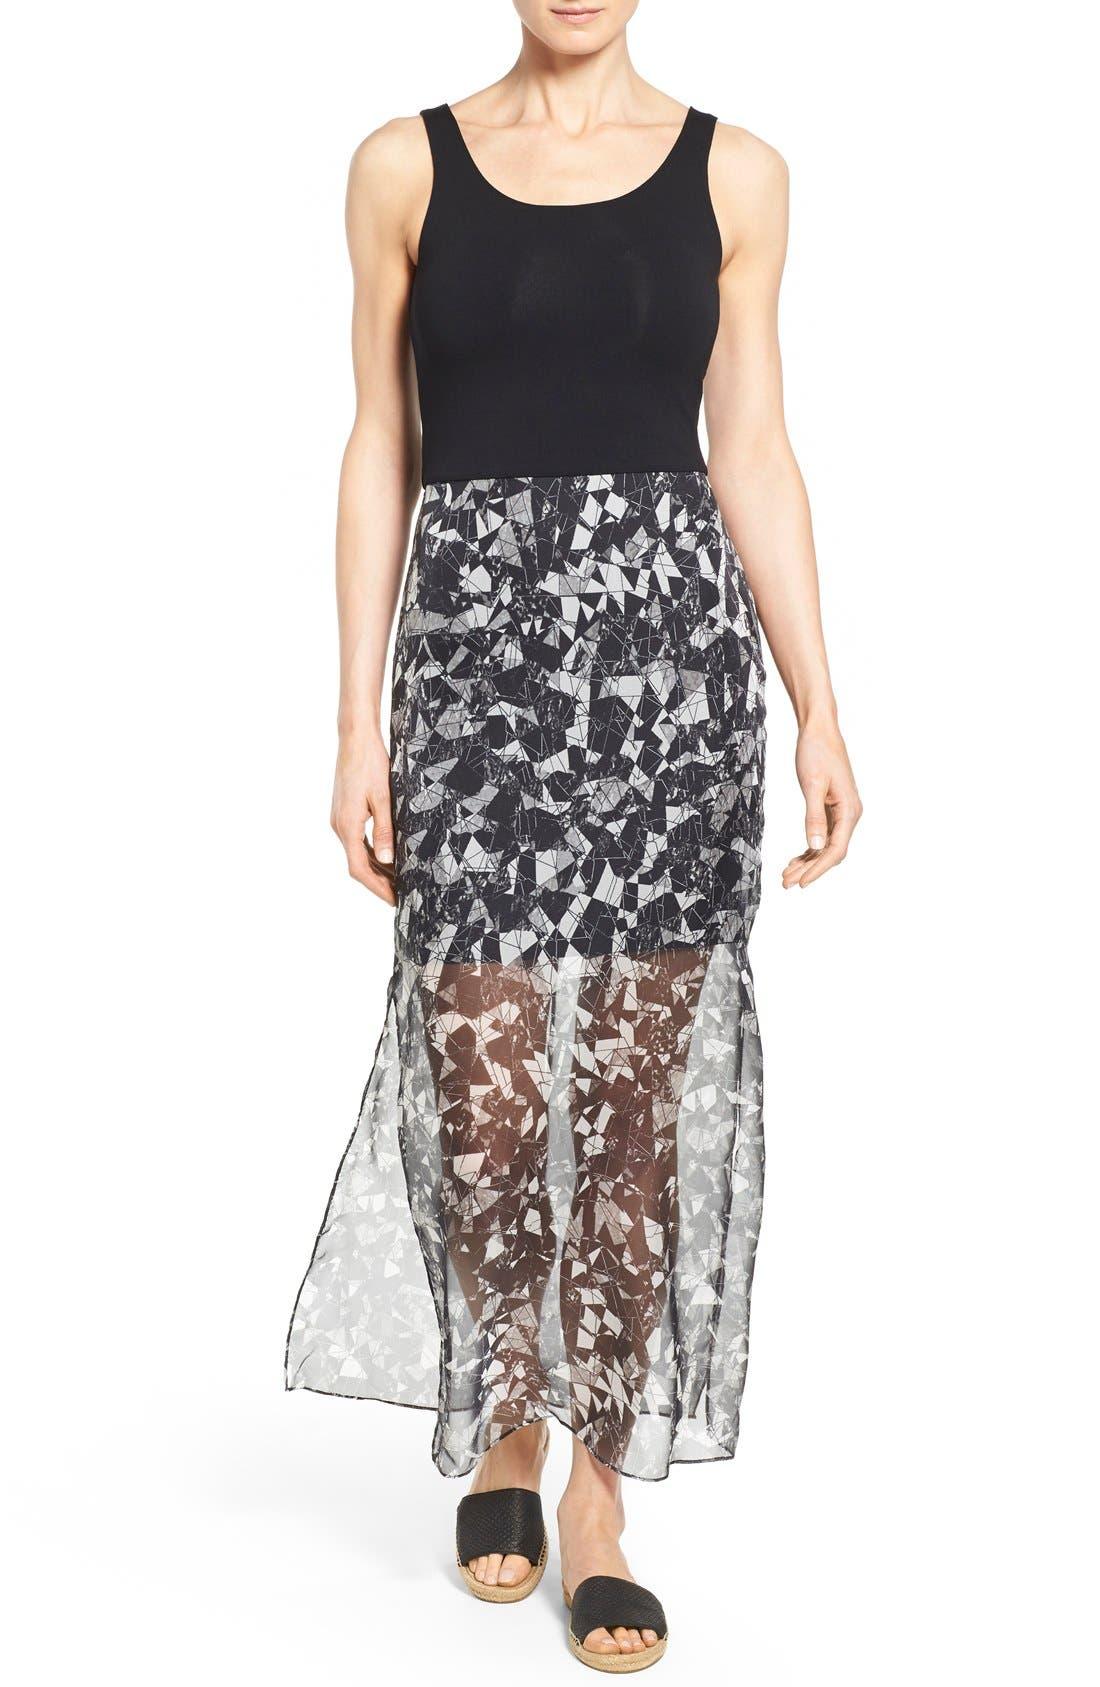 Alternate Image 1 Selected - Vince Camuto Print Chiffon Overlay Maxi Dress (Regular & Petite)